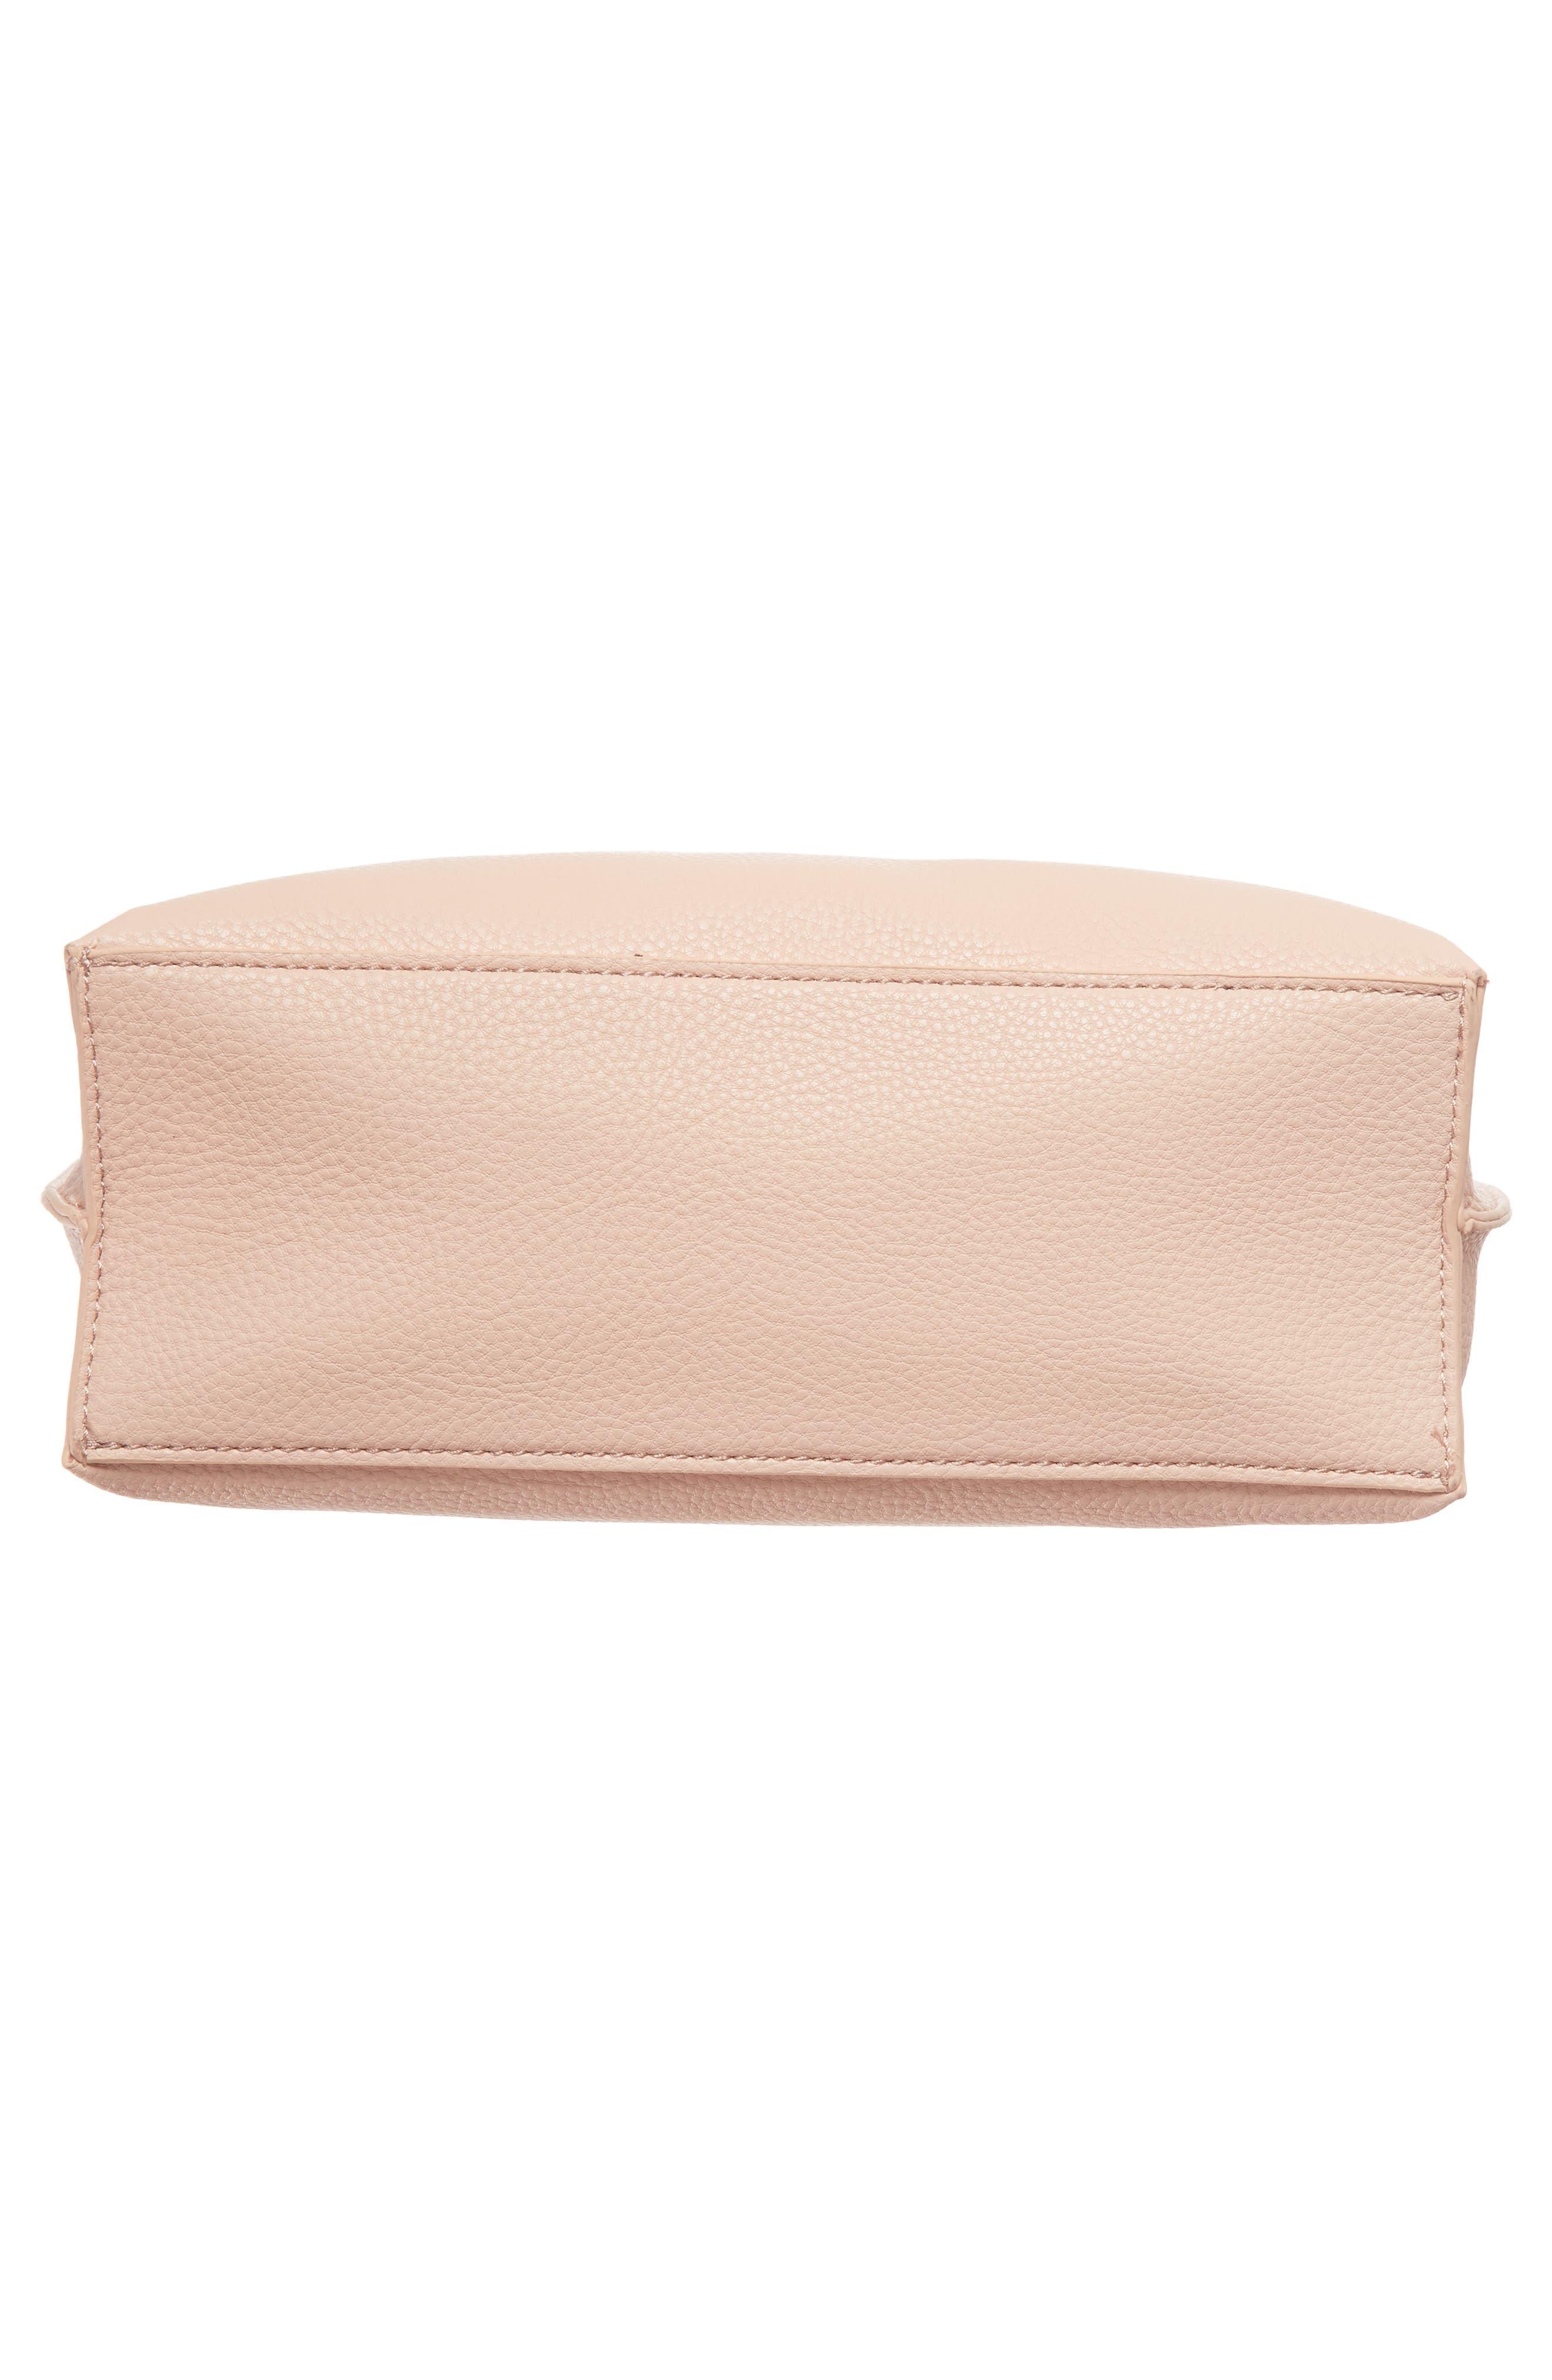 Metal Handle Faux Leather Crossbody Bag,                             Alternate thumbnail 6, color,                             Blush